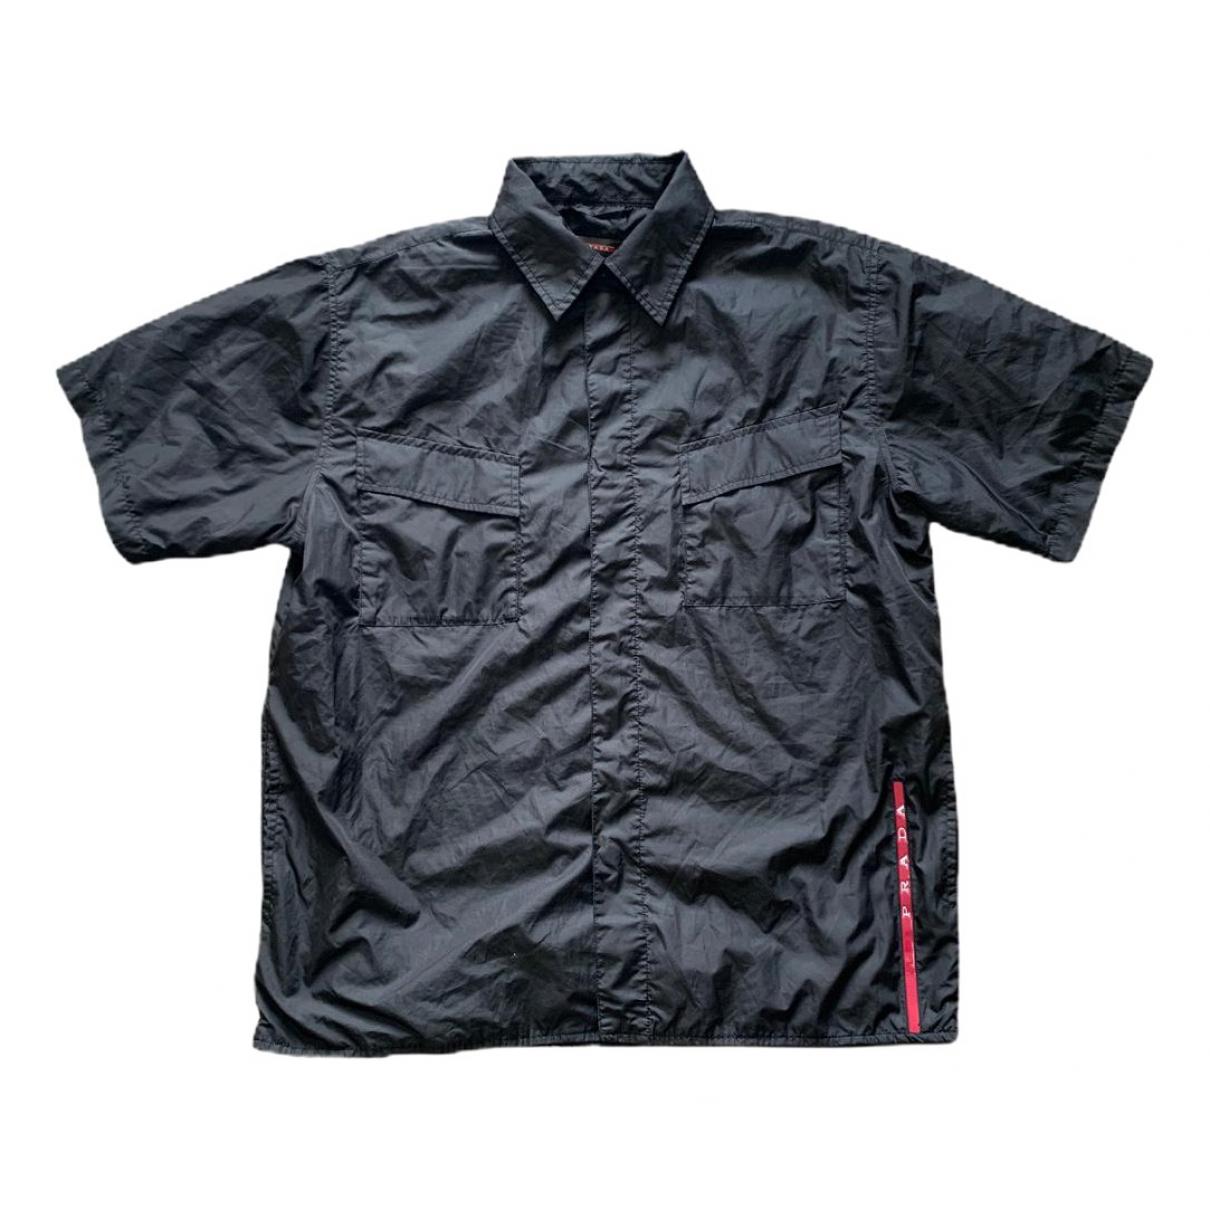 Prada \N Black Shirts for Men L International